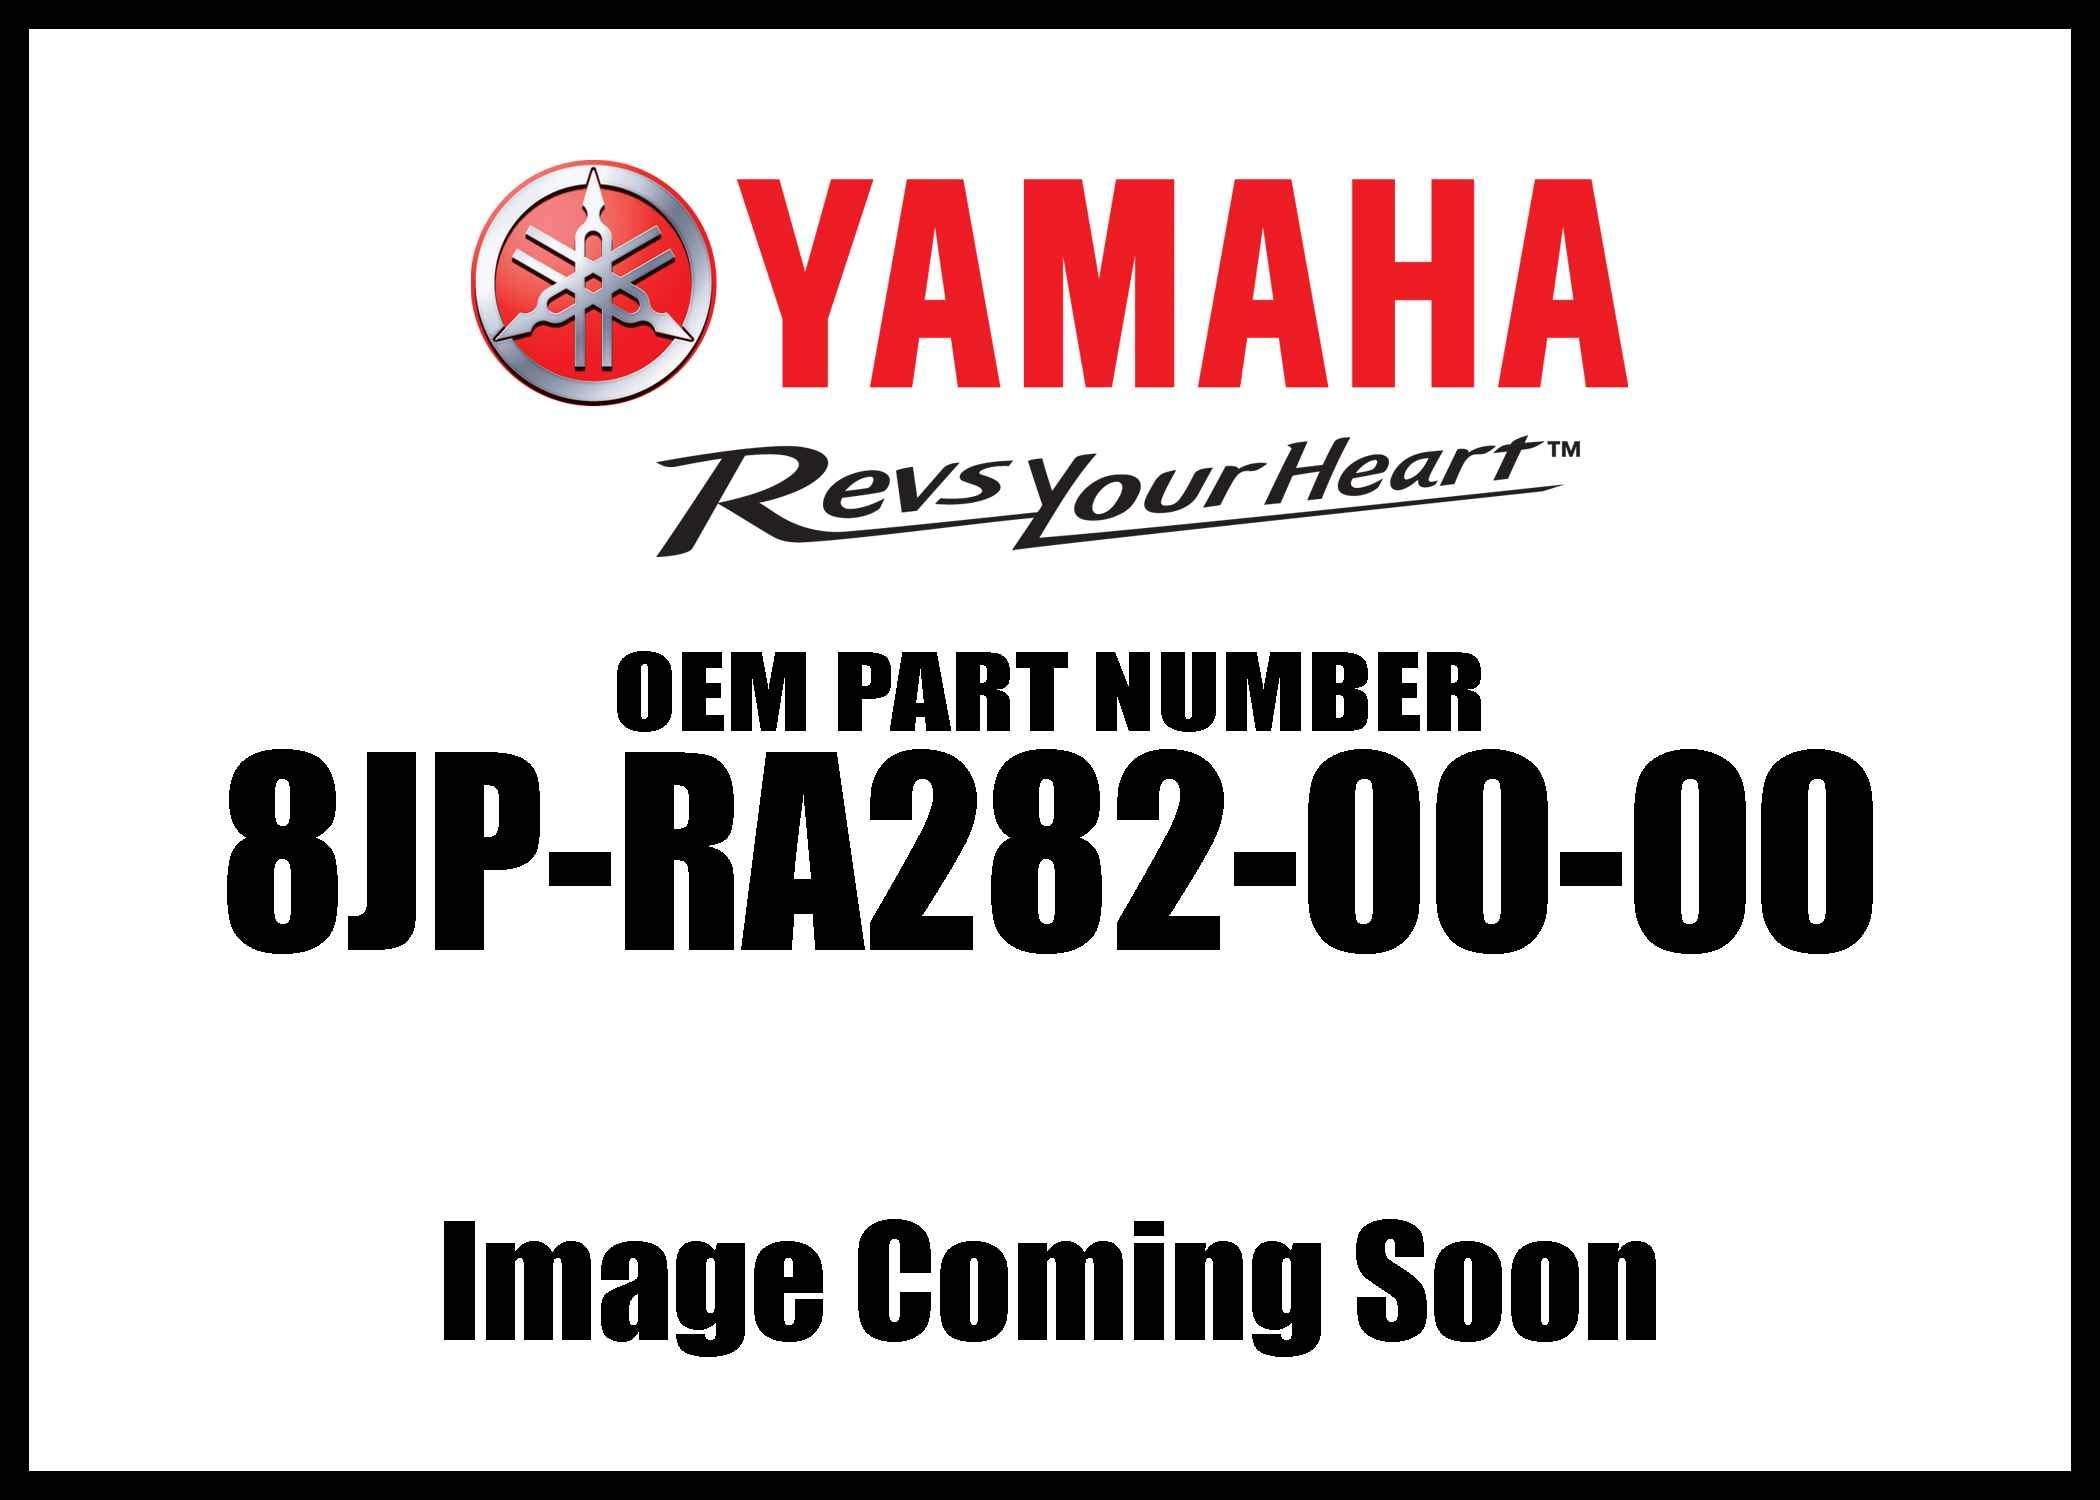 Yamaha Screw Tapping M6x 8Jp-Ra282-00-00 New Oem